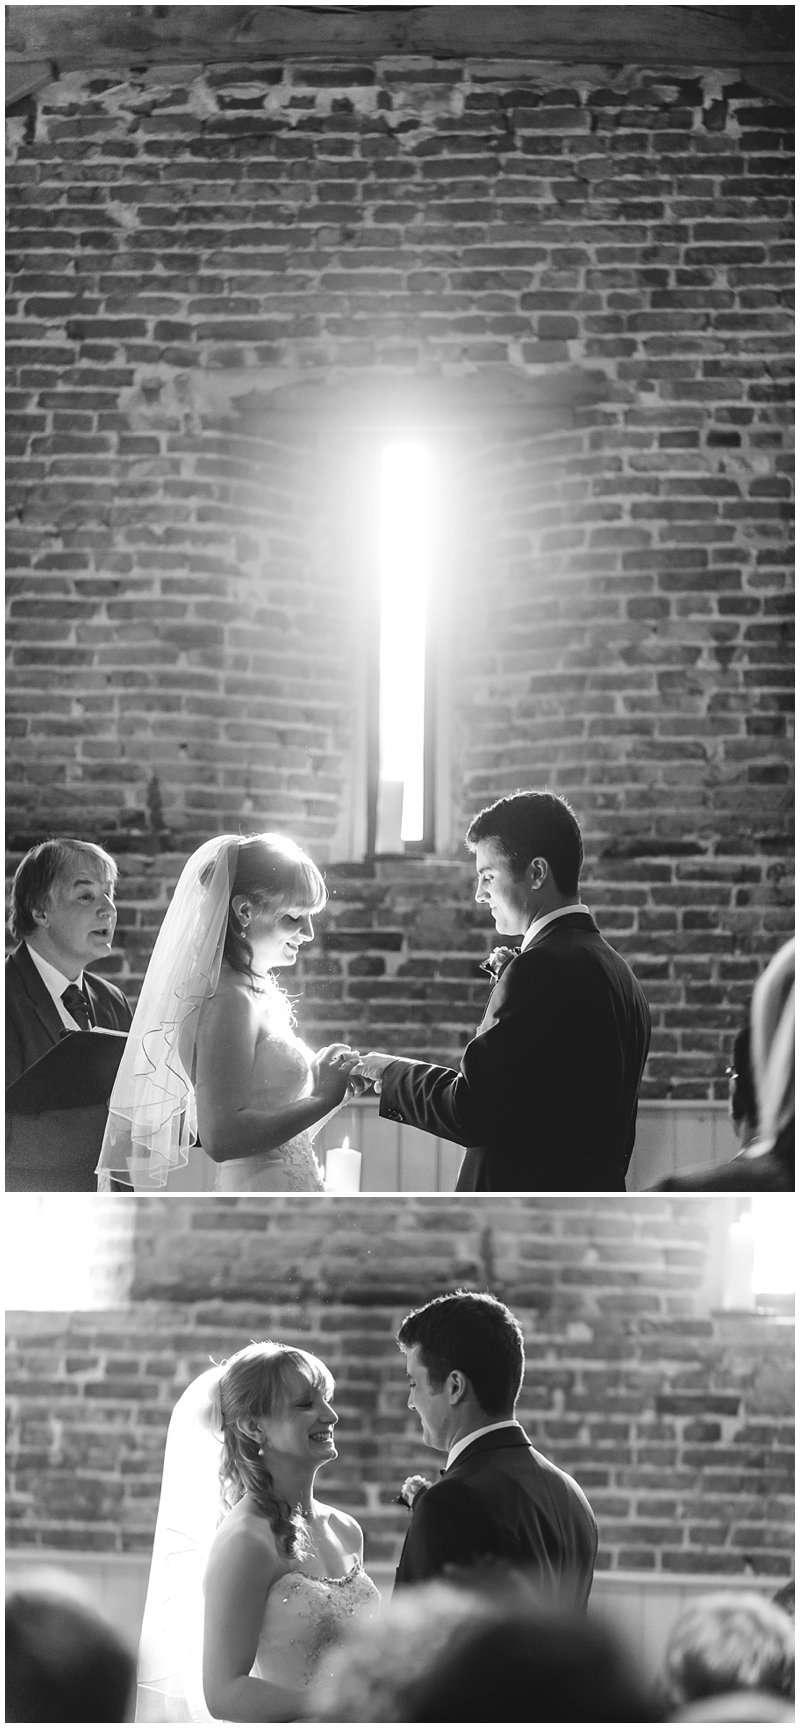 JEN AND MARCUS ELMS BARN WEDDING - NORFOLK WEDDING PHOTOGRAPHER 39